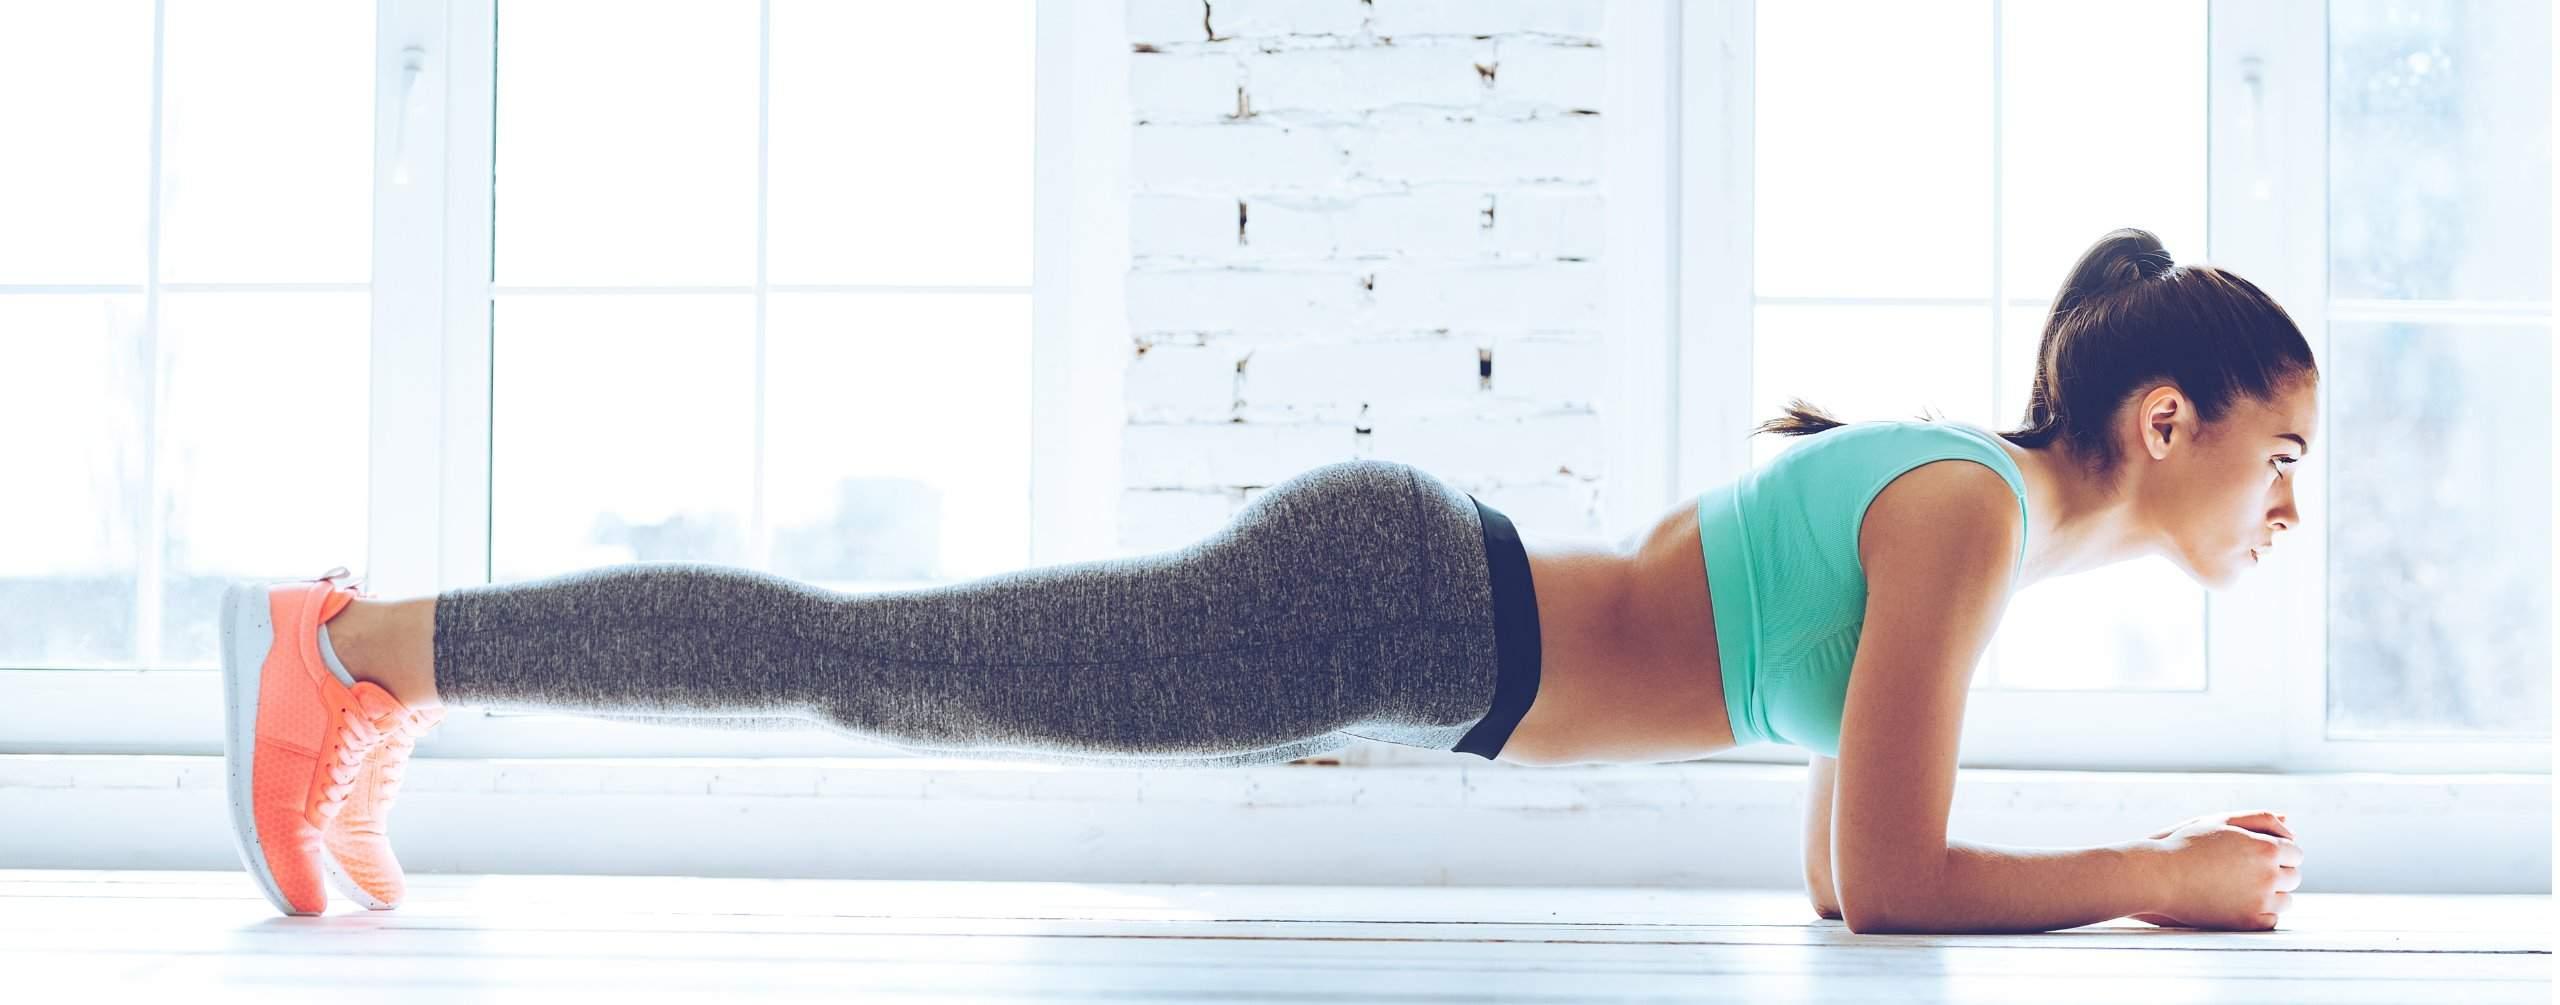 Frau macht eine Sportübung.